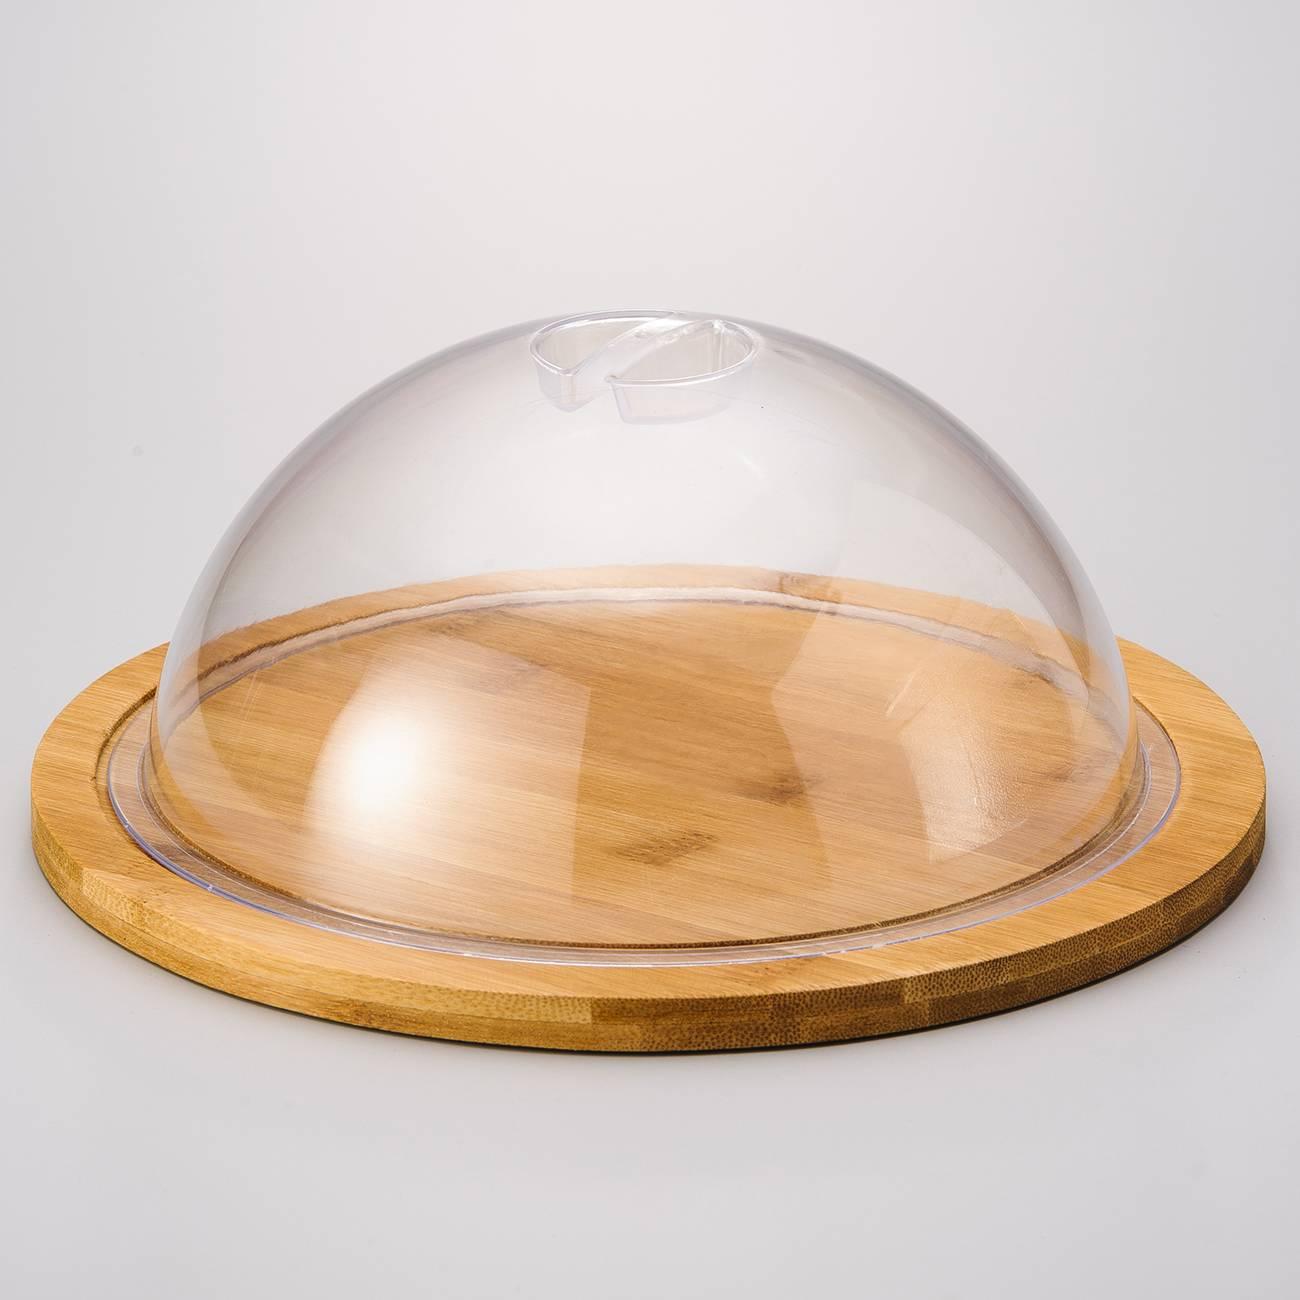 Tábua com Tampa Dome Dy em Bambu - Bon Gourmet - 25x10,5 cm